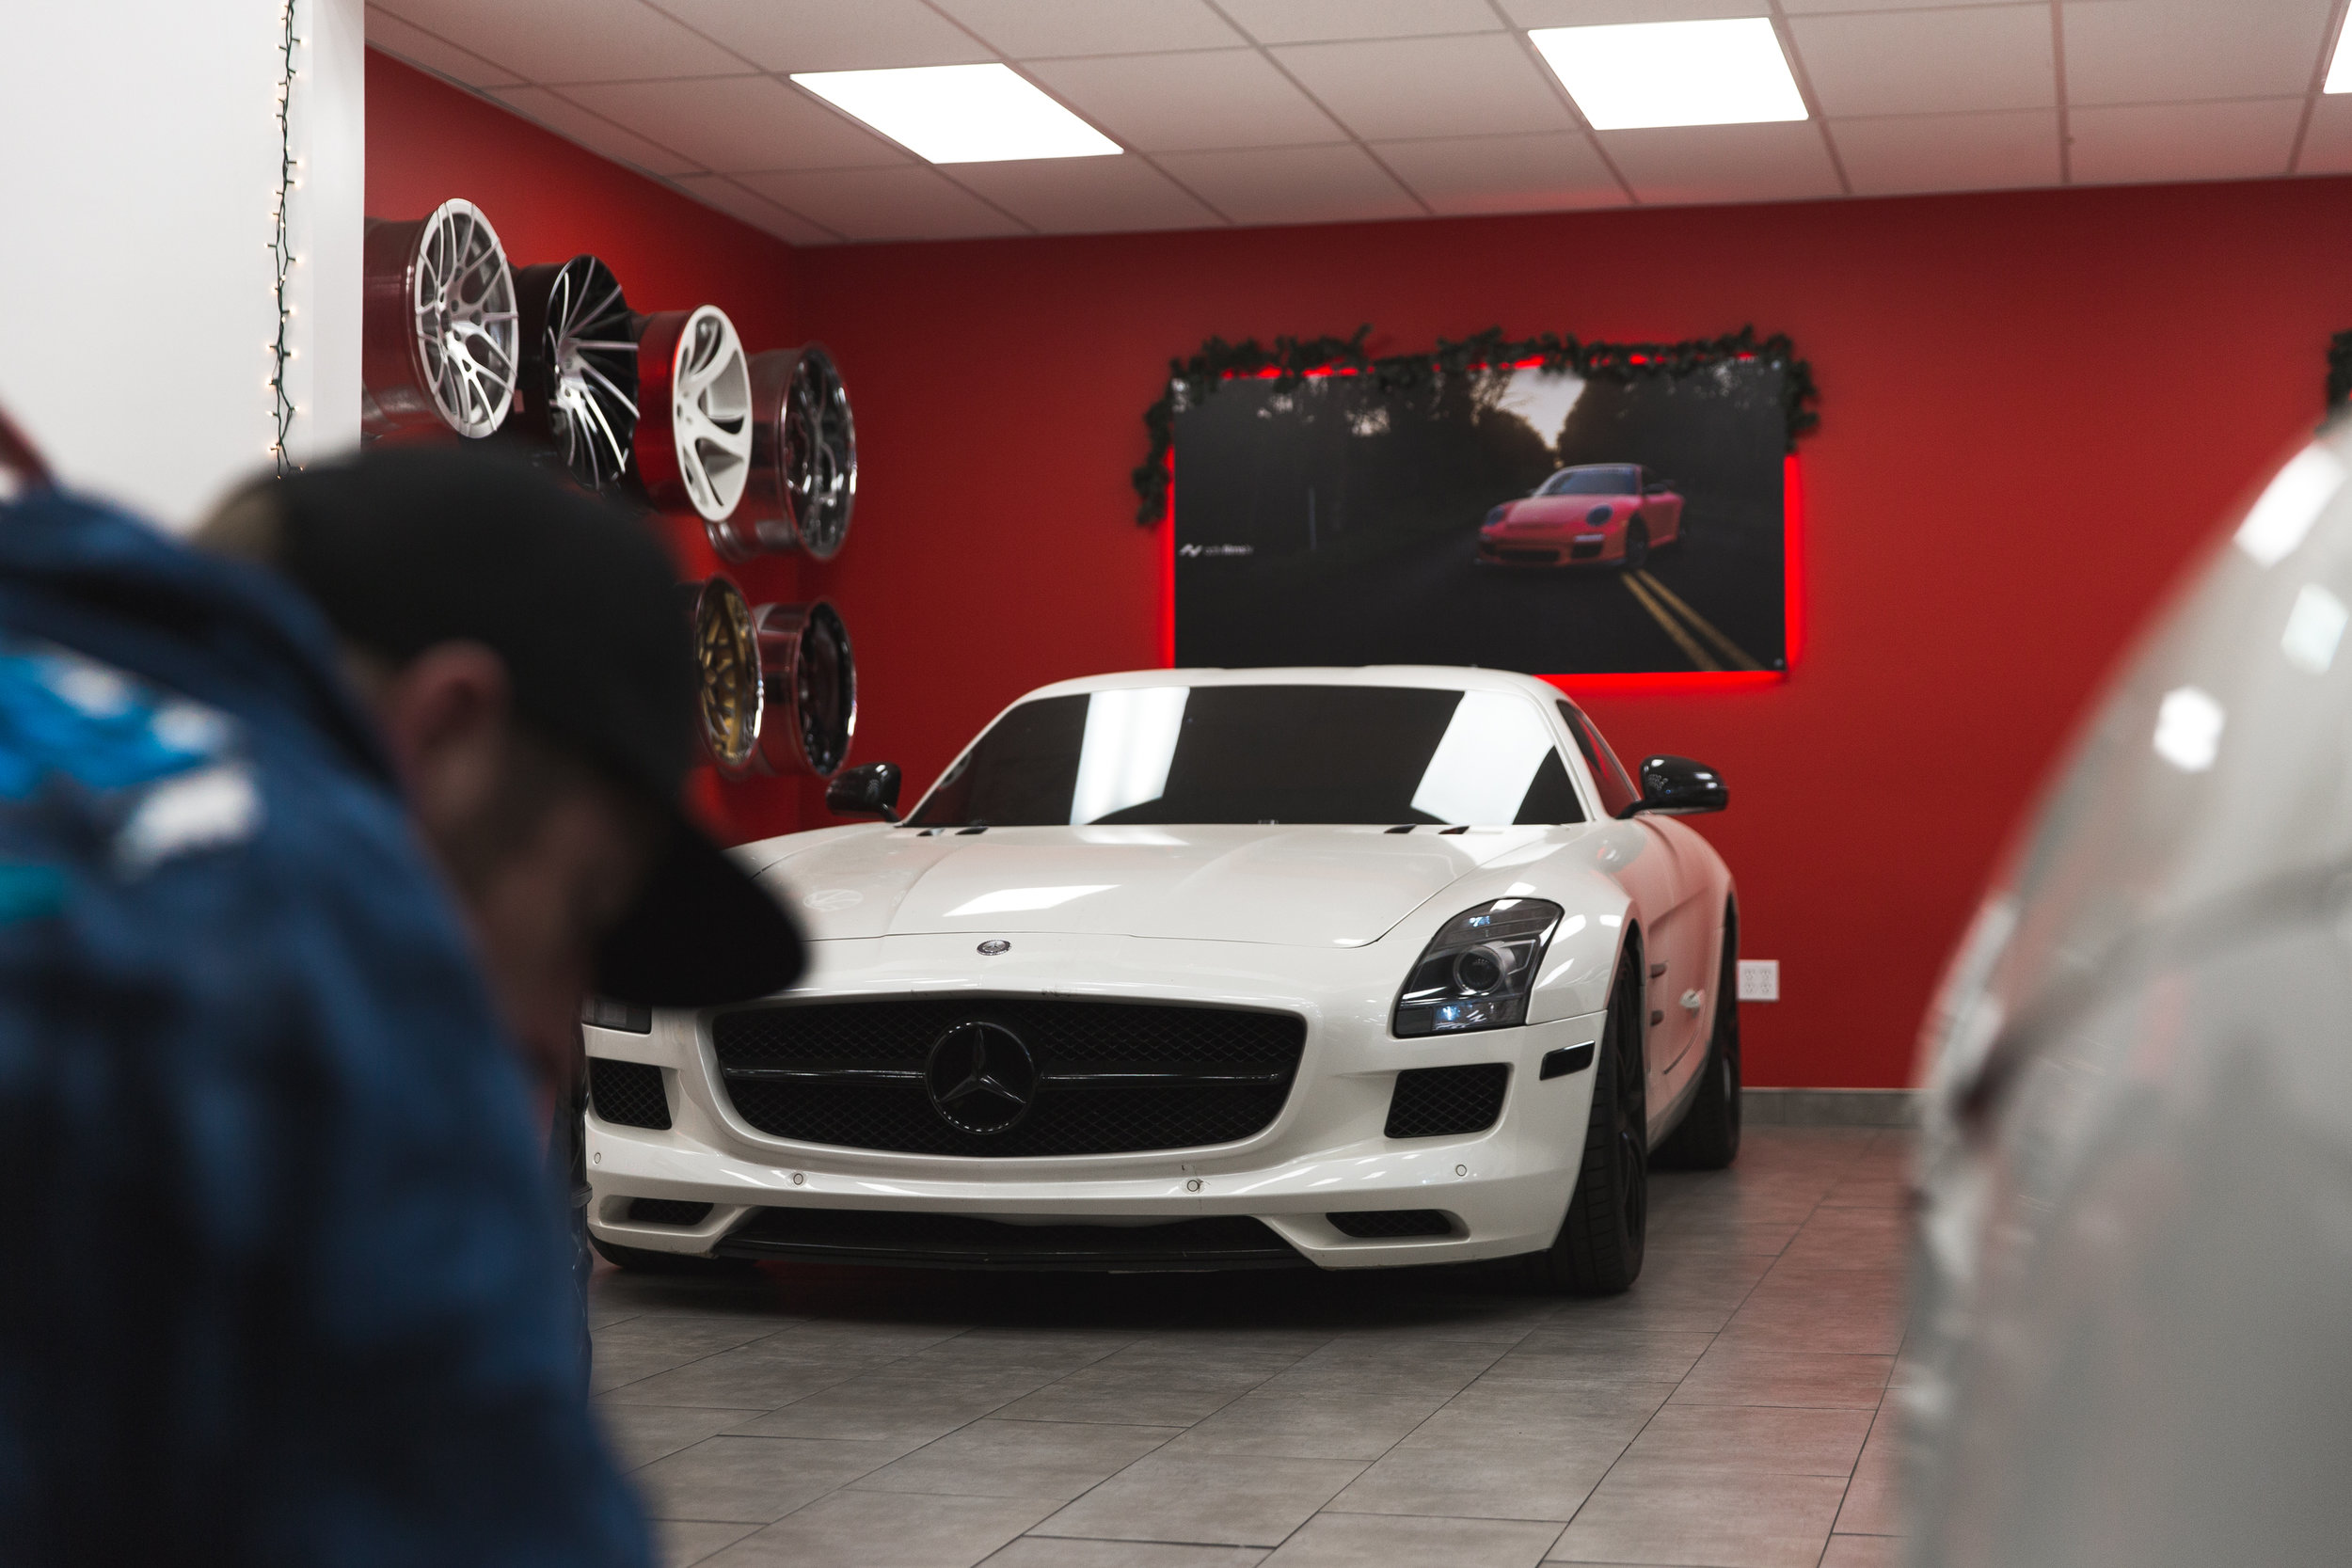 Stay_Driven_Sacramento_Diamond_Autosport-5.jpg